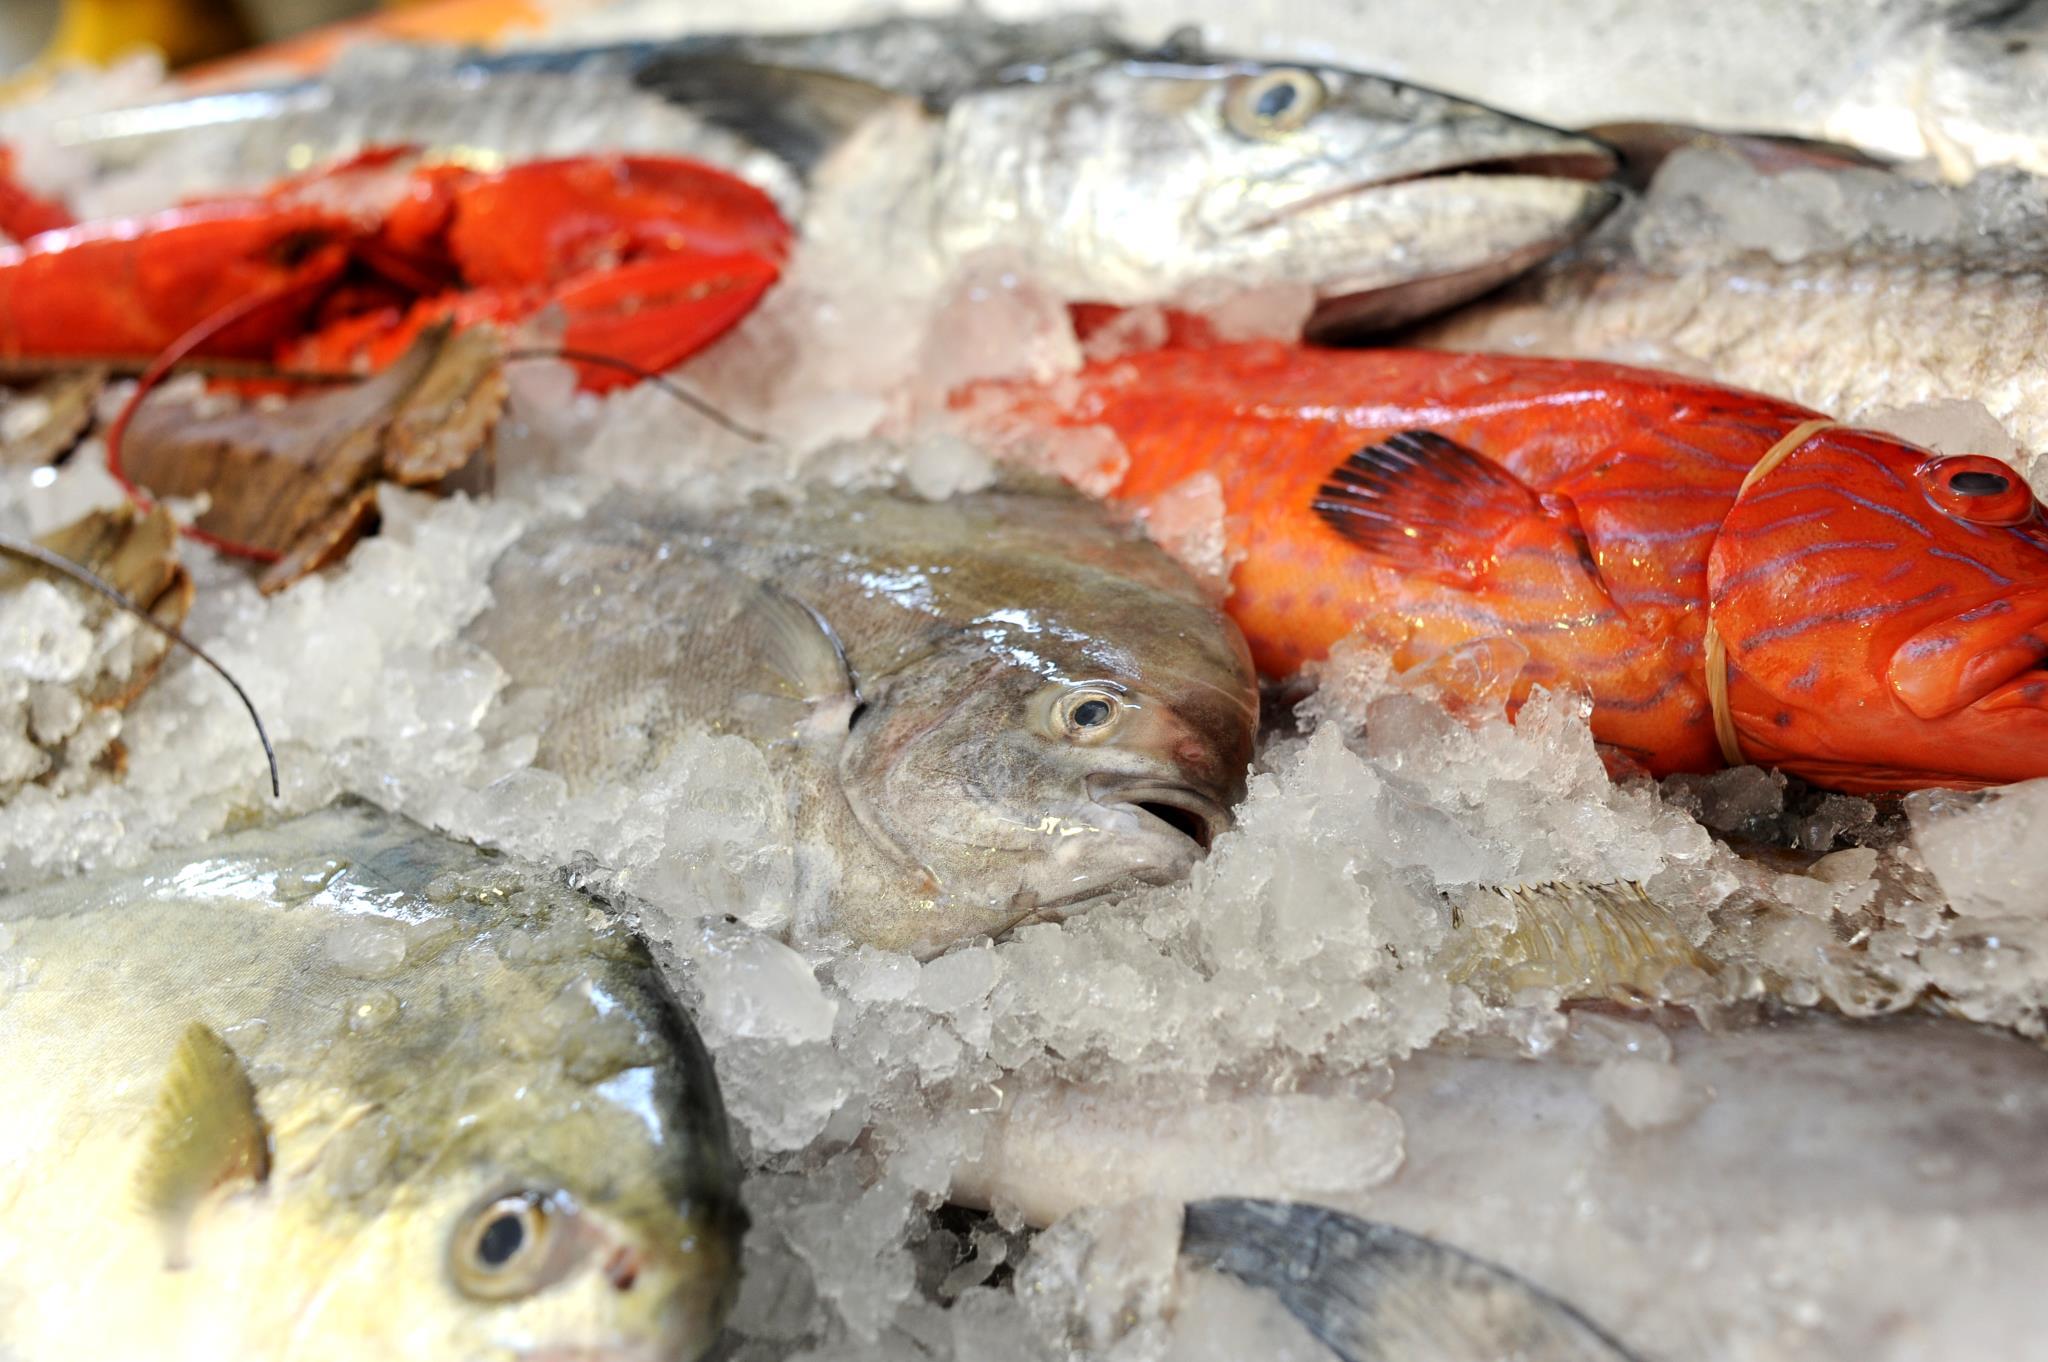 wholesale-food-factories-song-fish-dealer